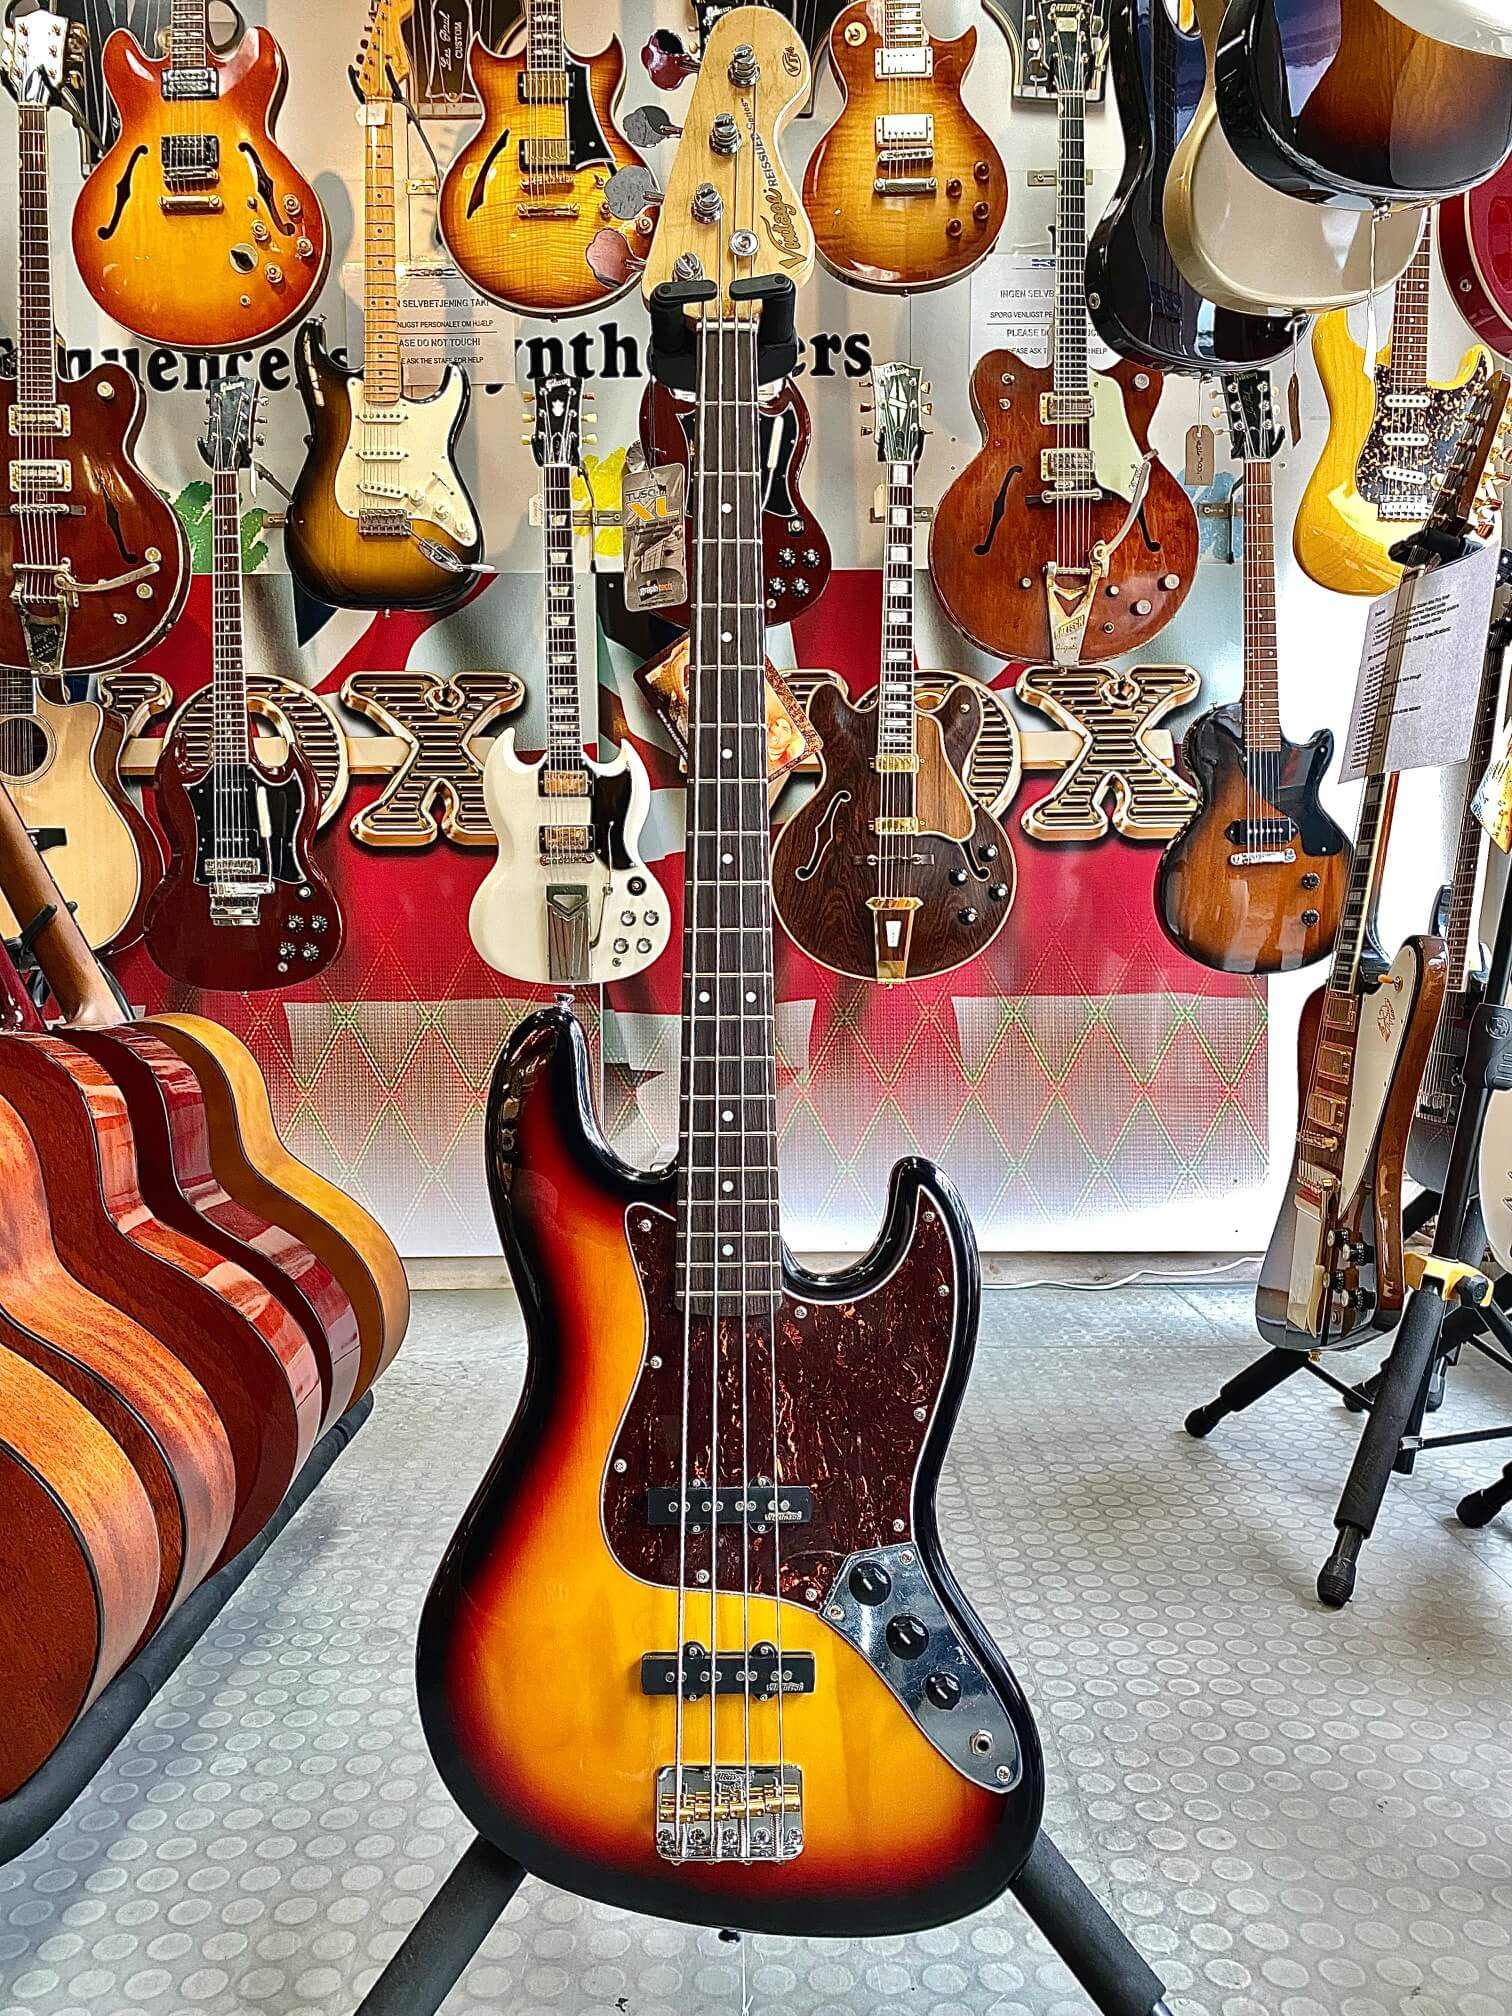 Vintage Ejm96 Bass